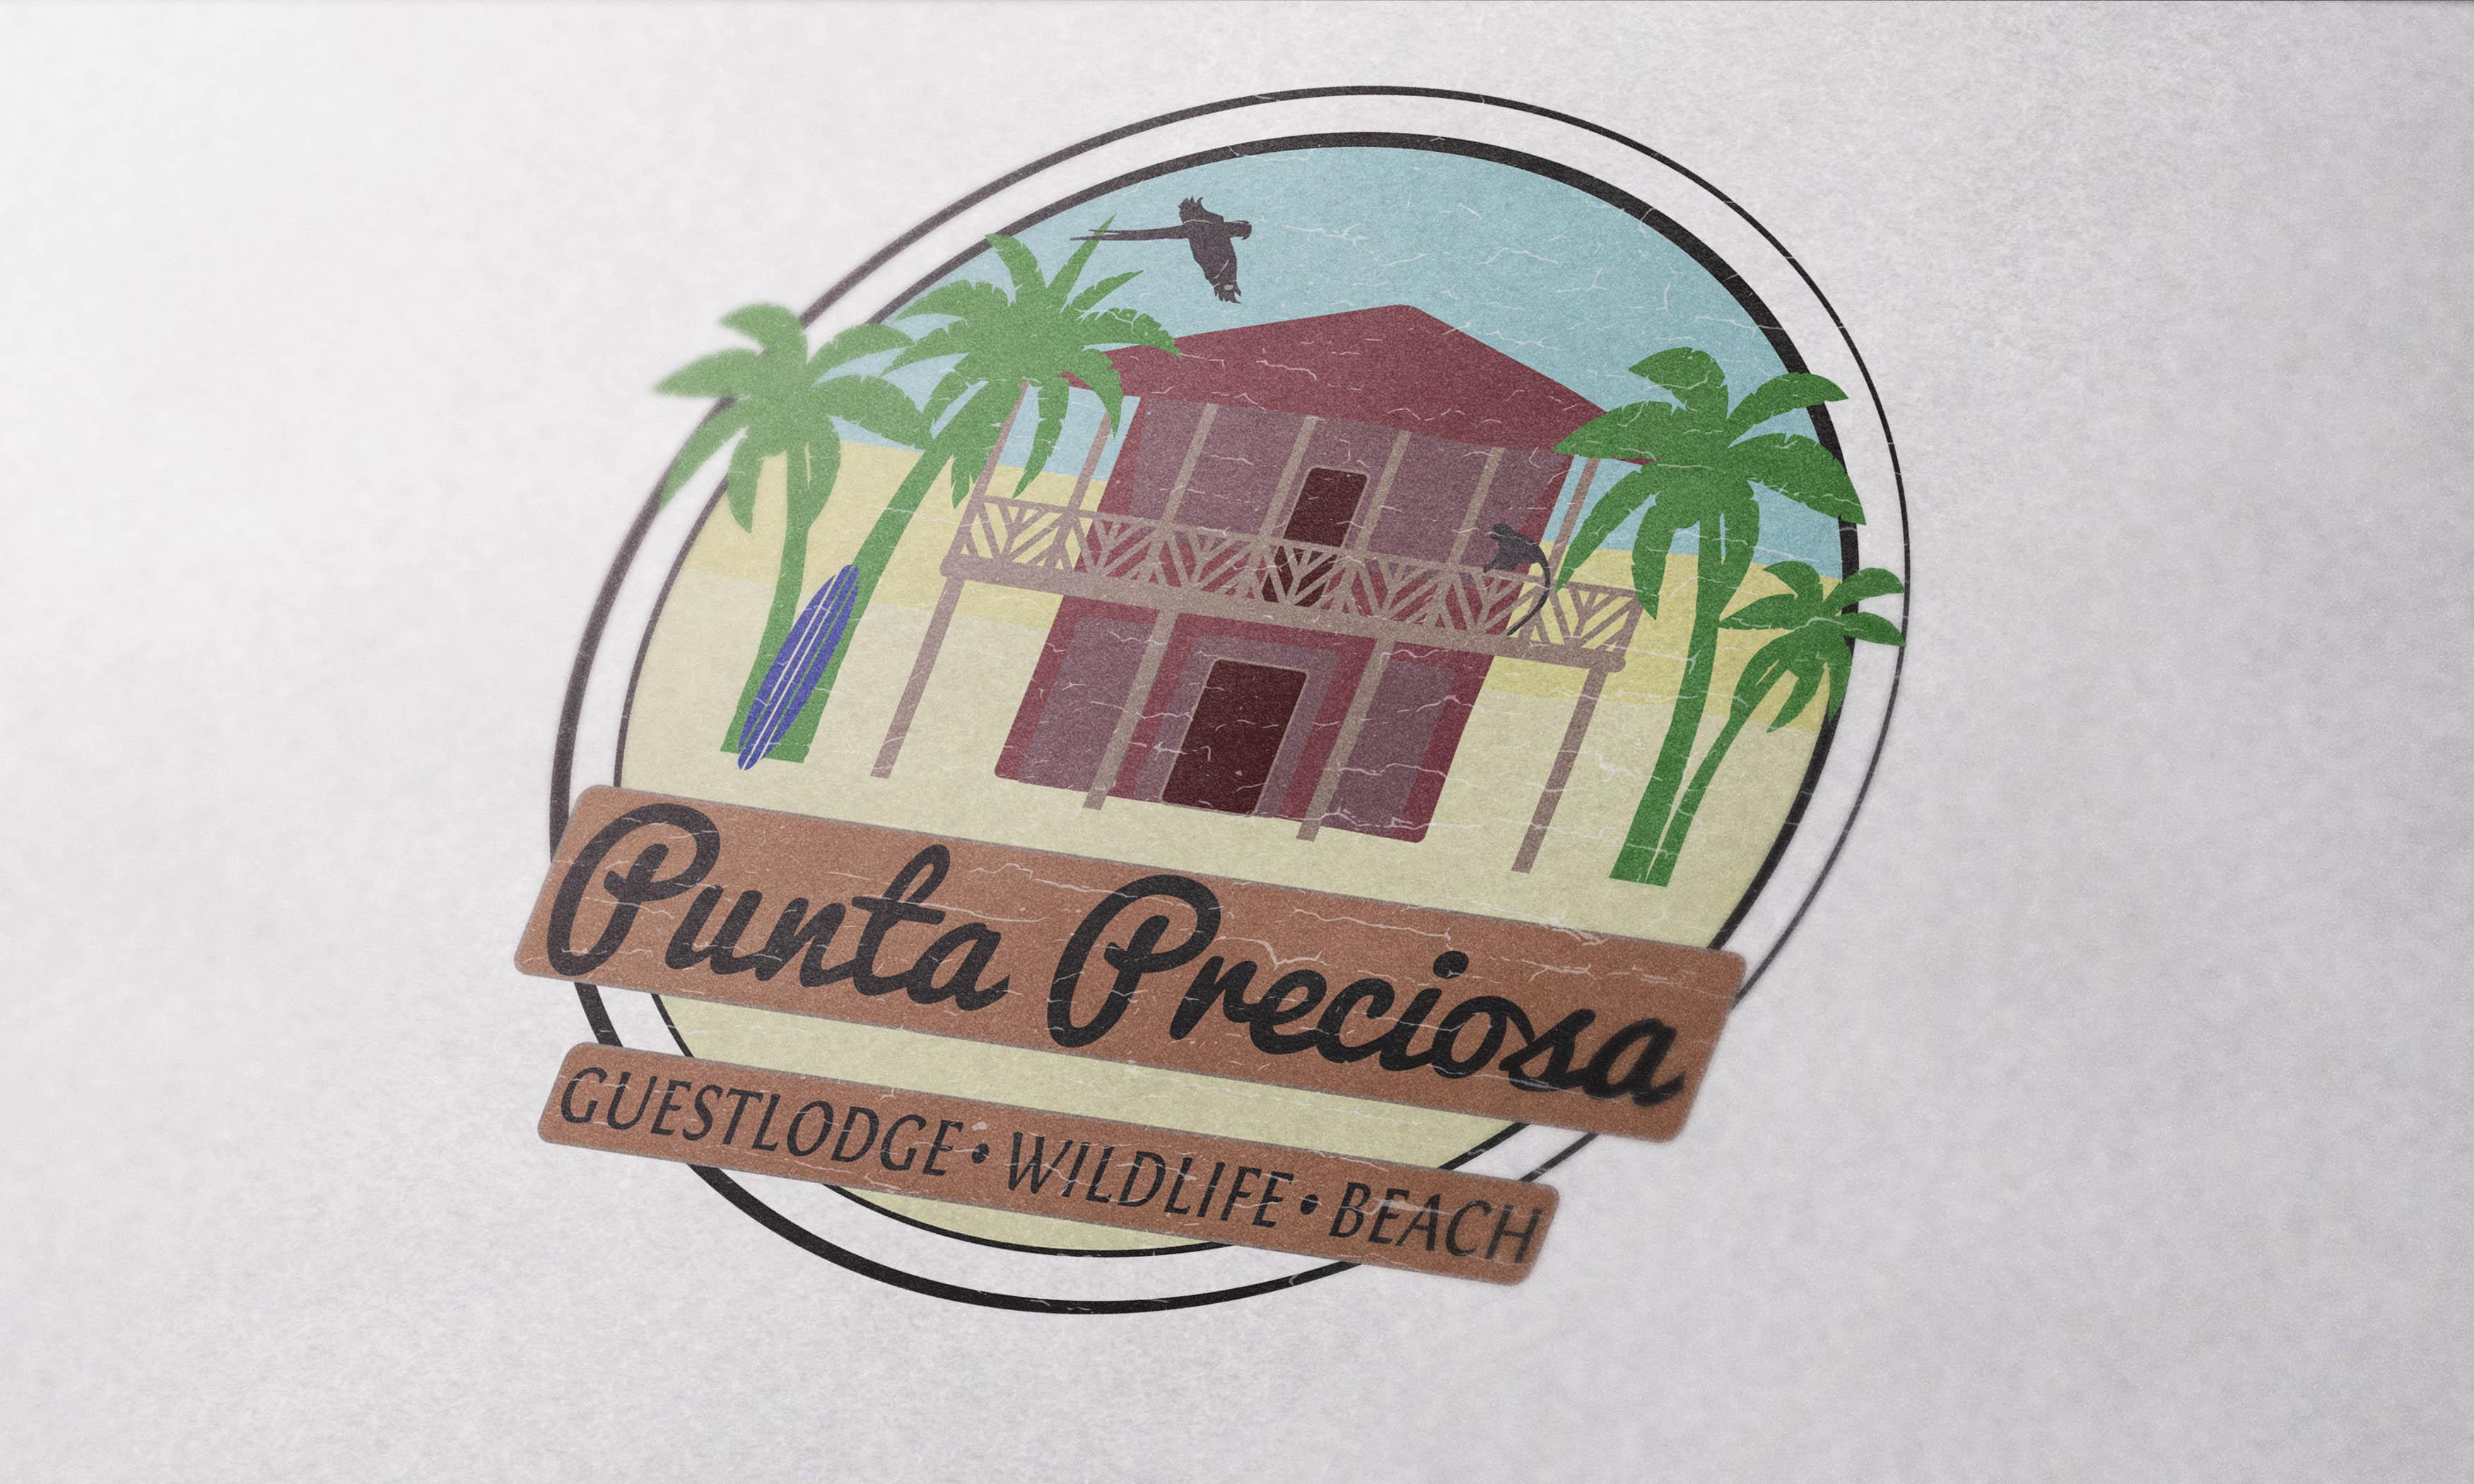 Punta Preciosa